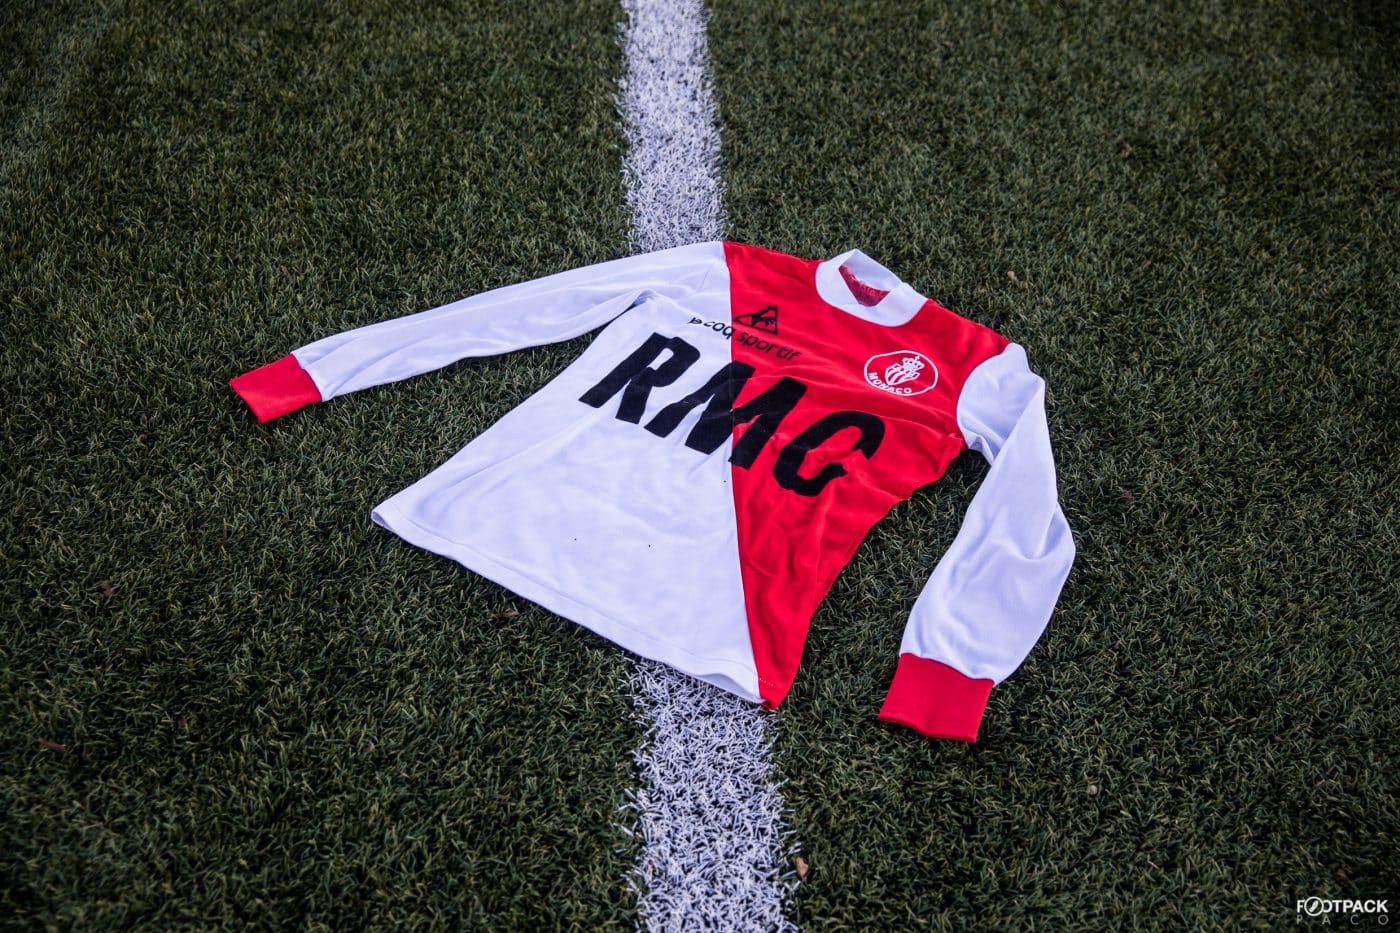 maillot-as-monaco-rmc-1977-1982-le-coq-sportif-1